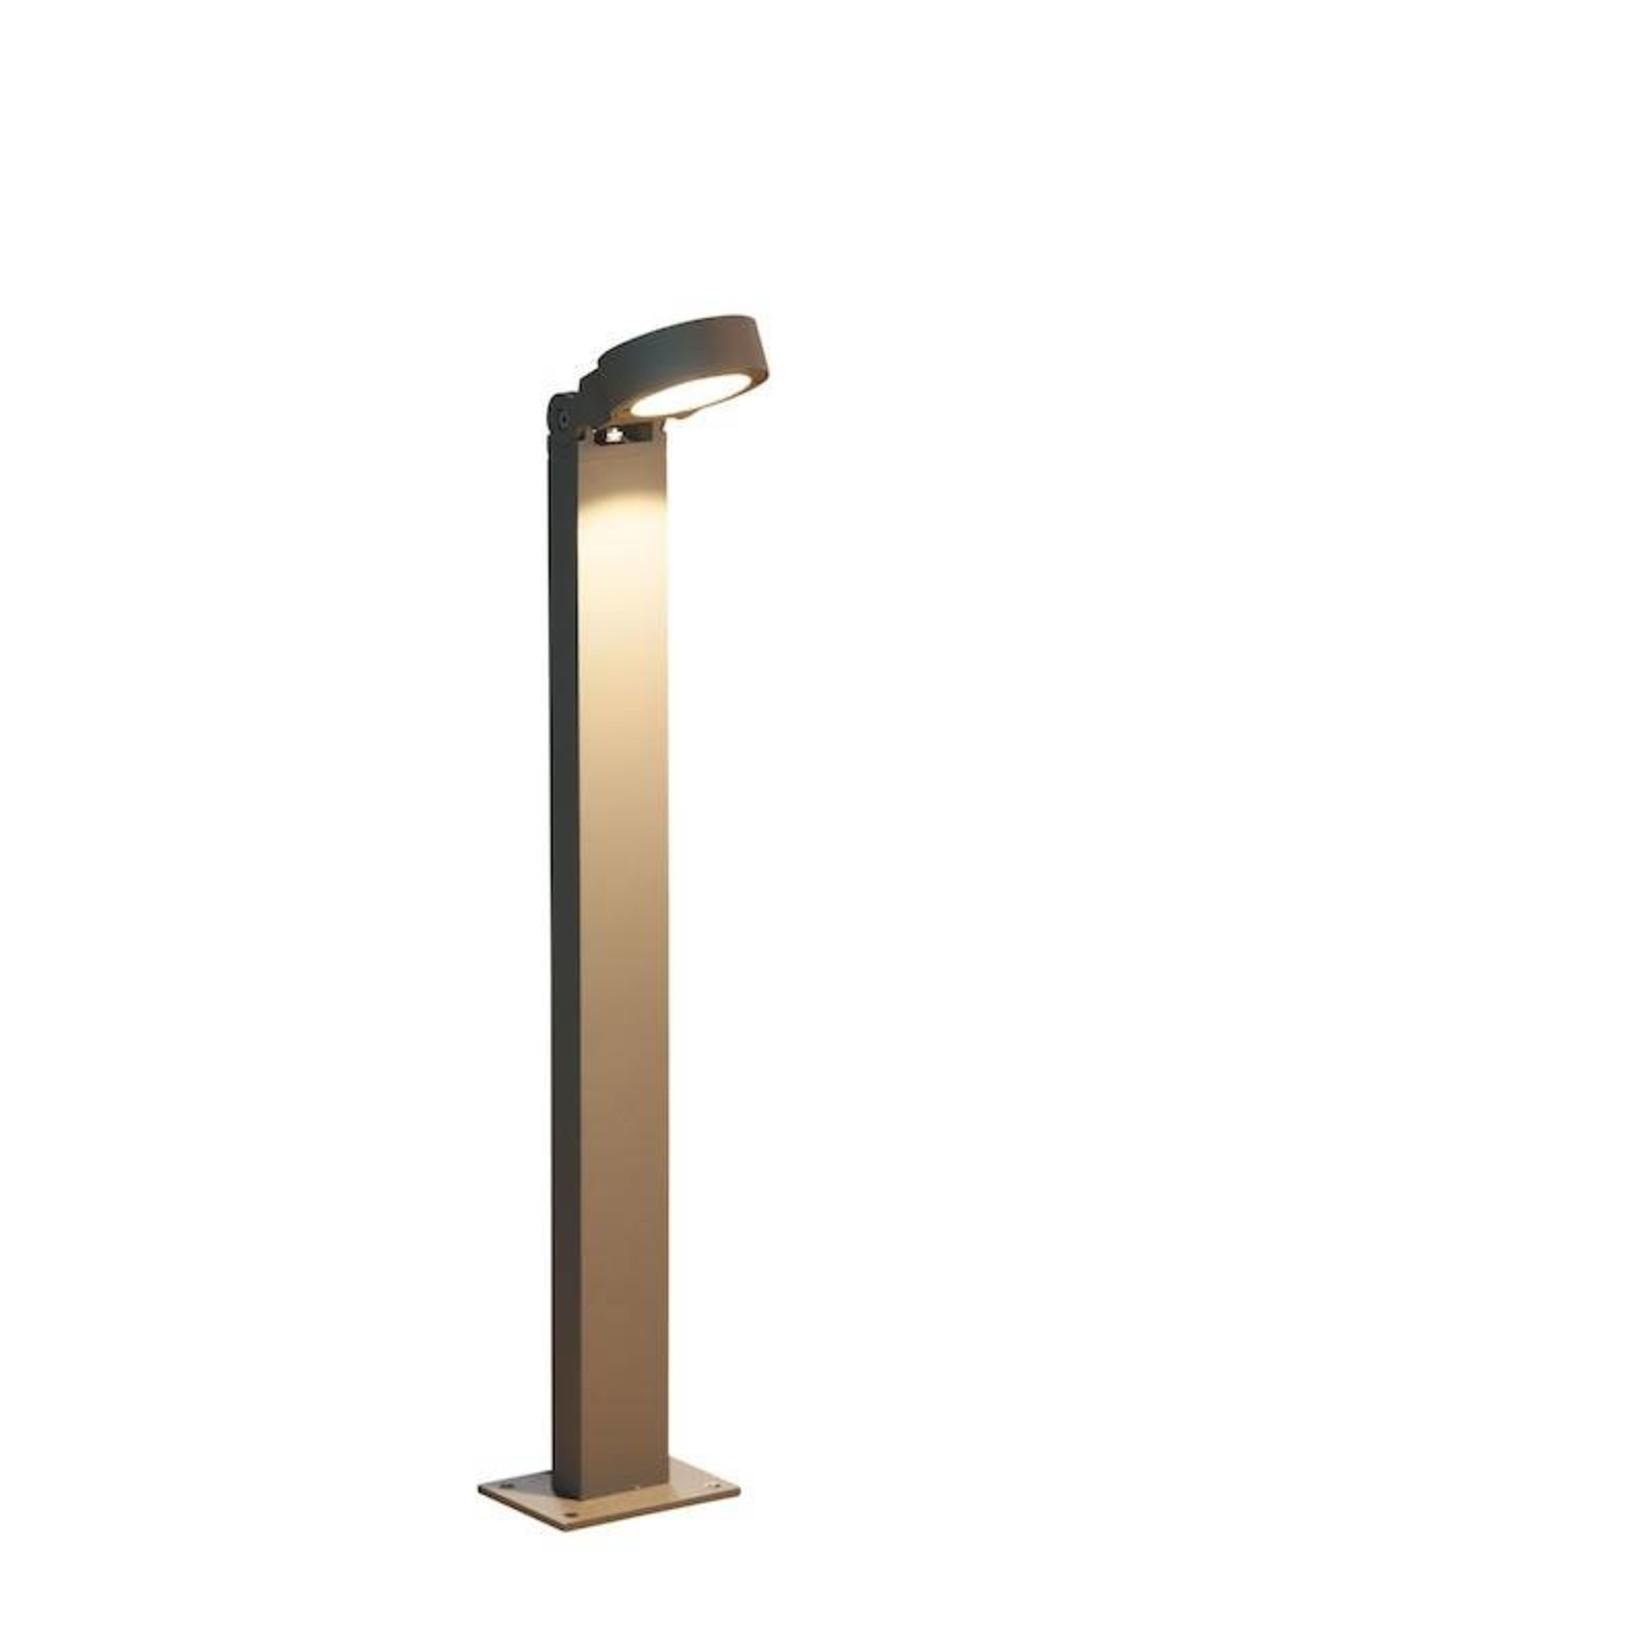 Smart Light tuinlamp 5W warm wit metaal